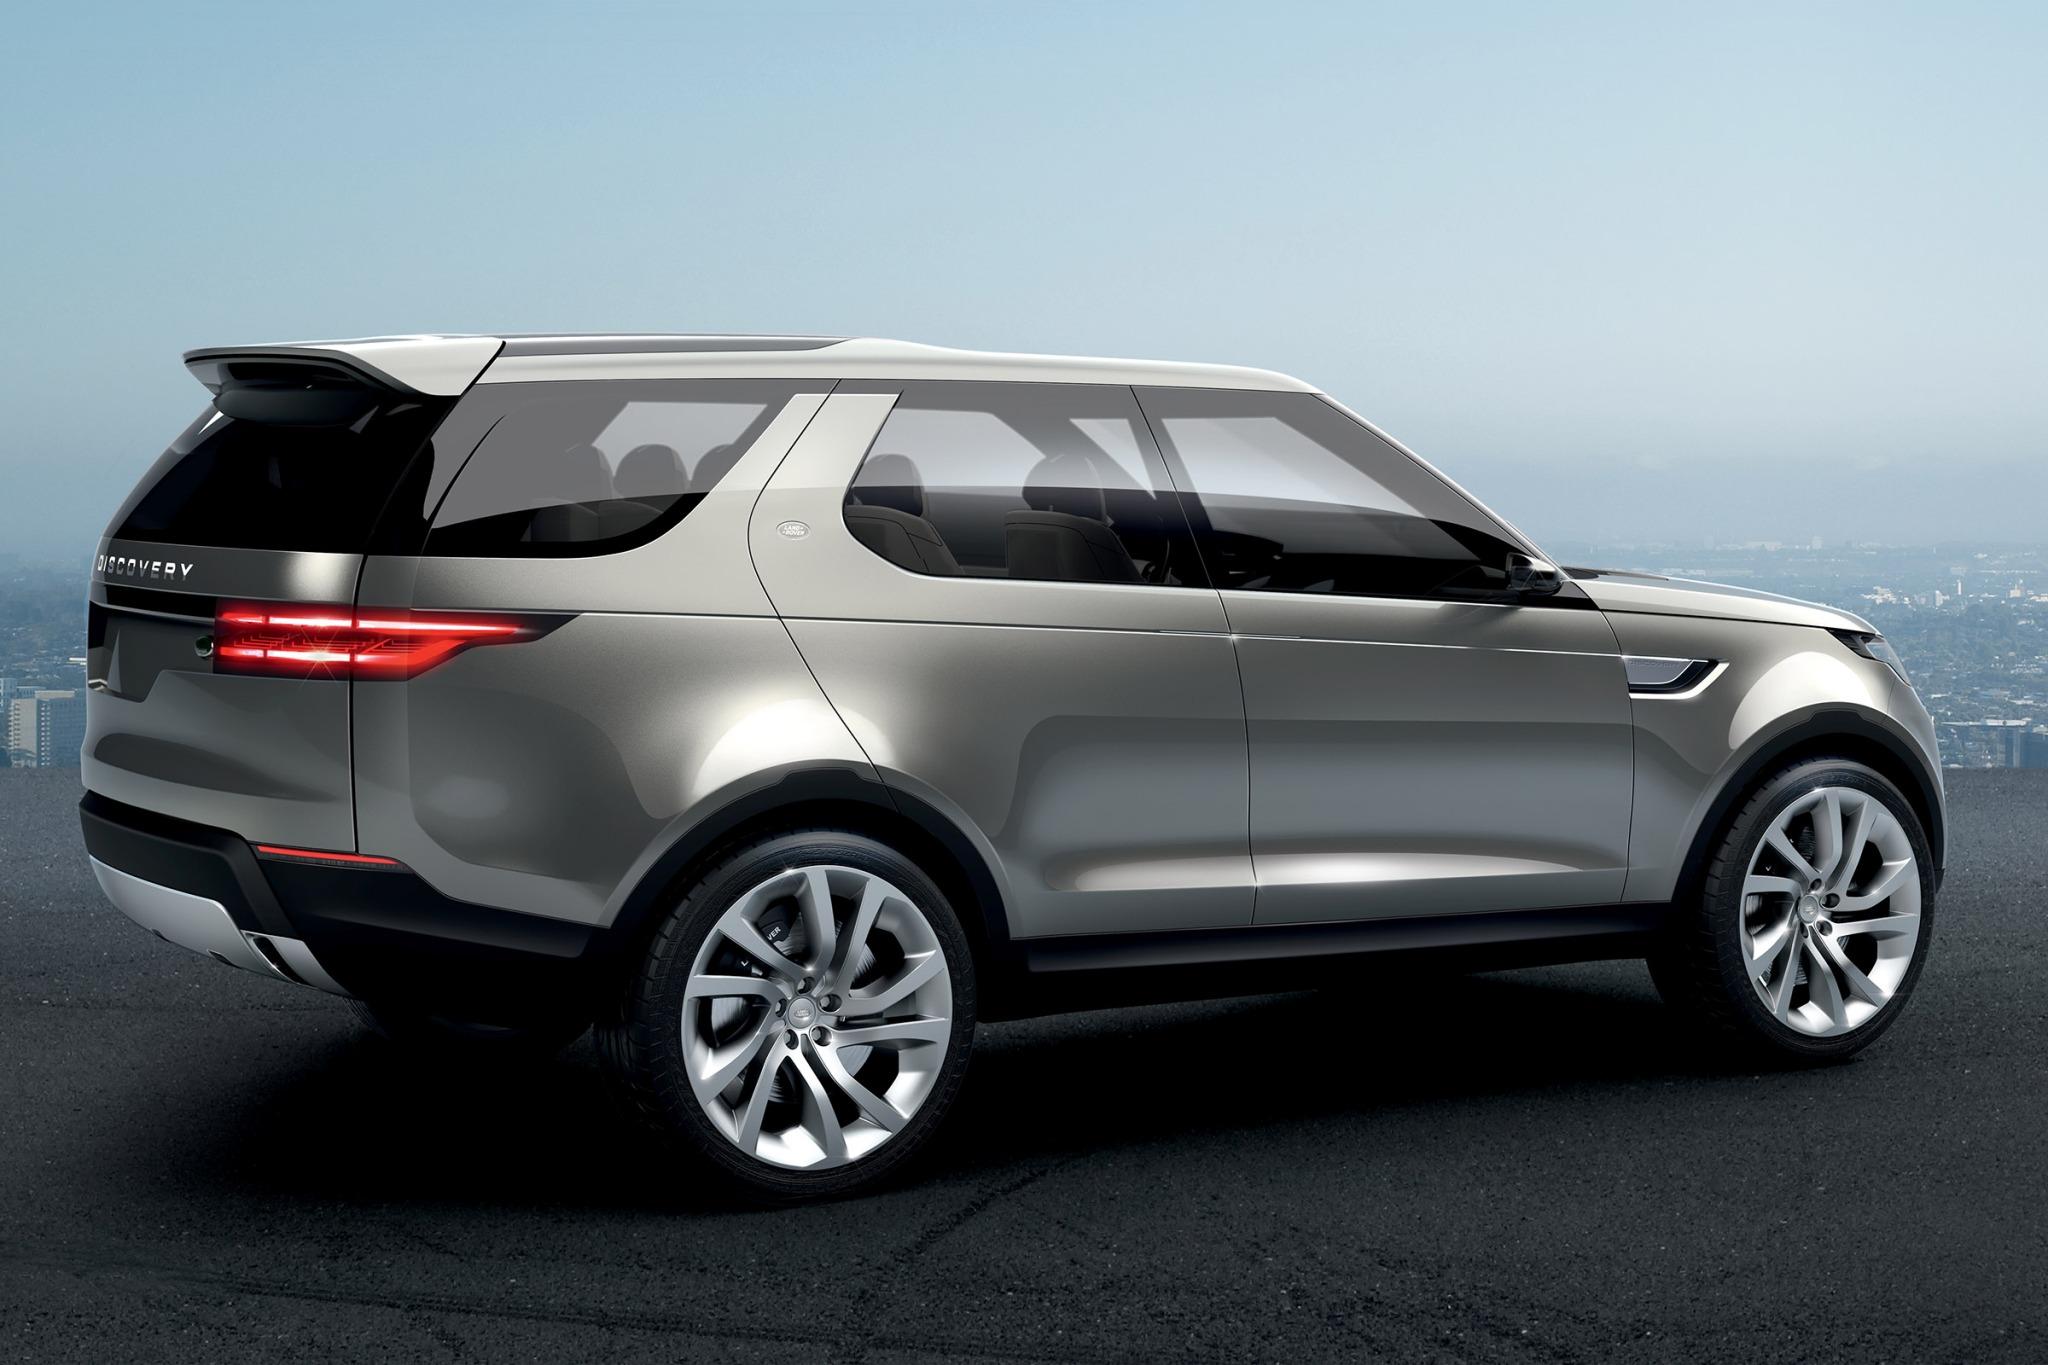 Photo of Land Rover Discovery 28 Eylül'de tanıtılacak